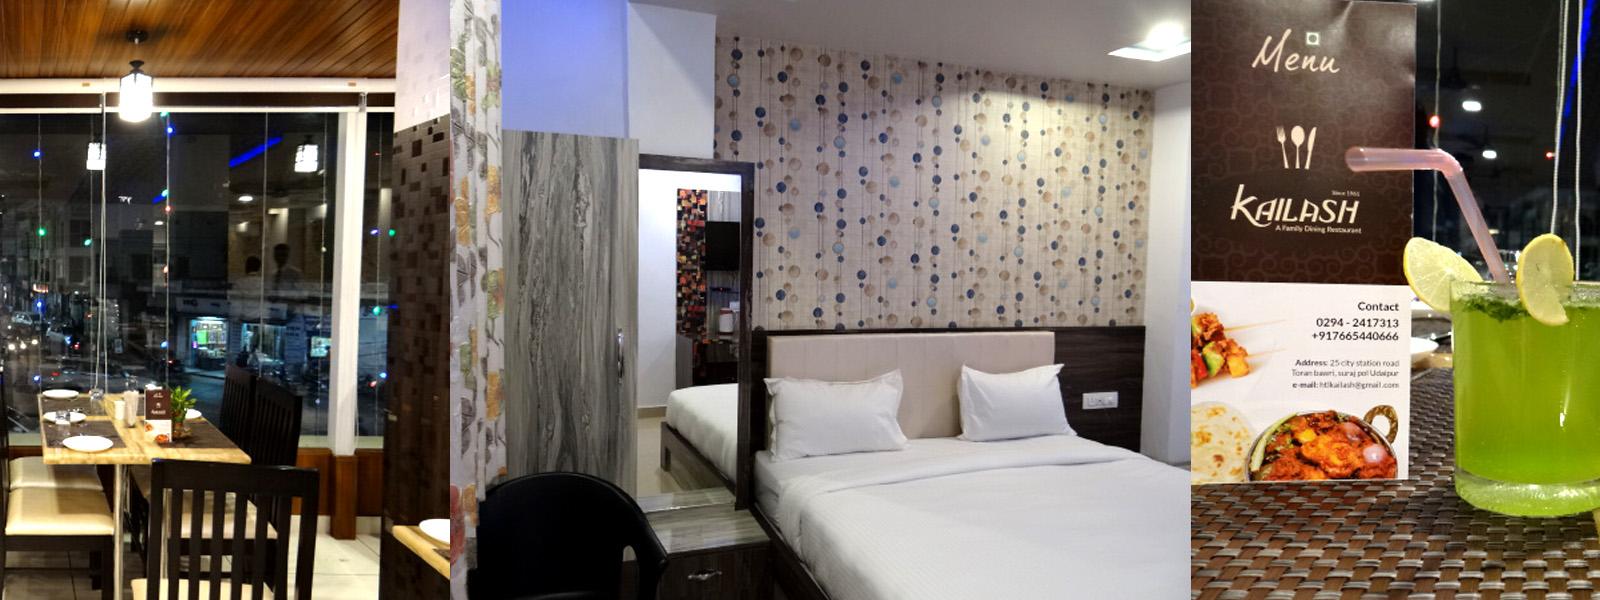 hotel-in-udaipur-rajasthan-india